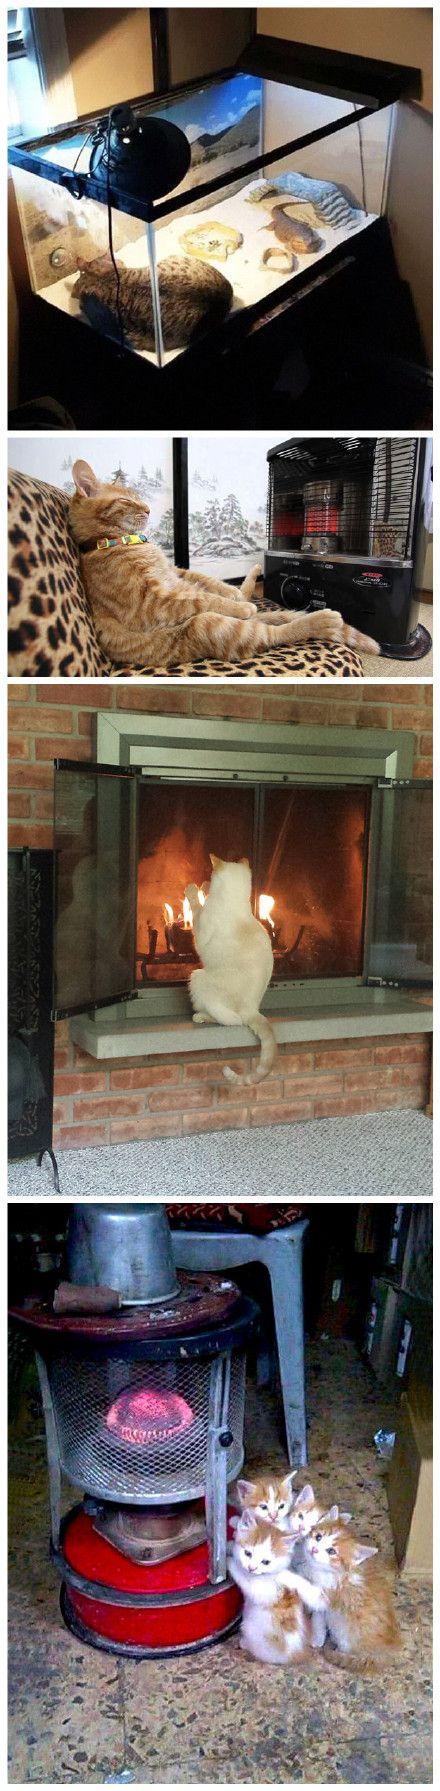 Cats need warmth - Album on Imgur